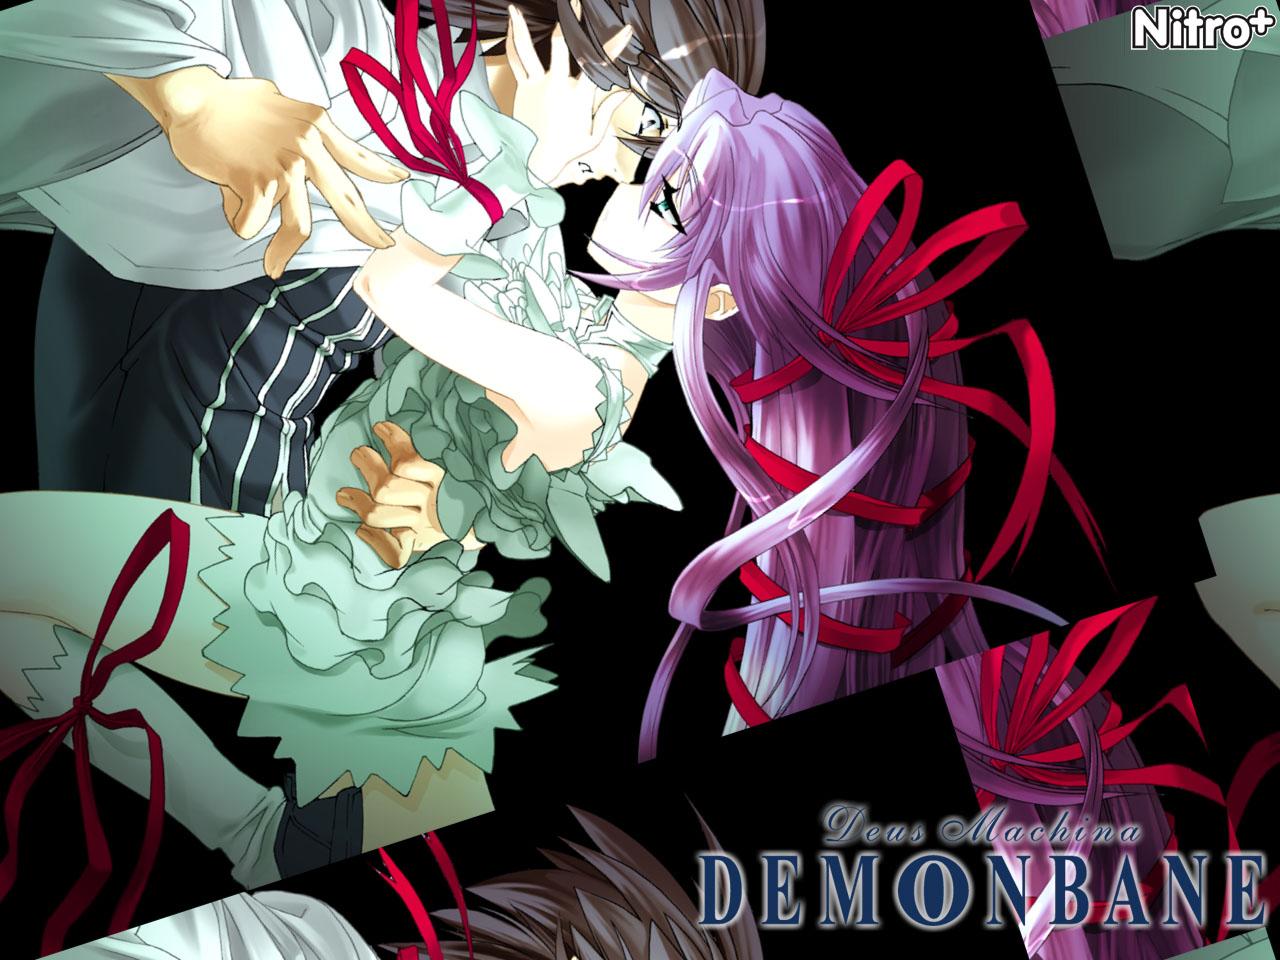 demonbane_wallpaper_9245.jpg